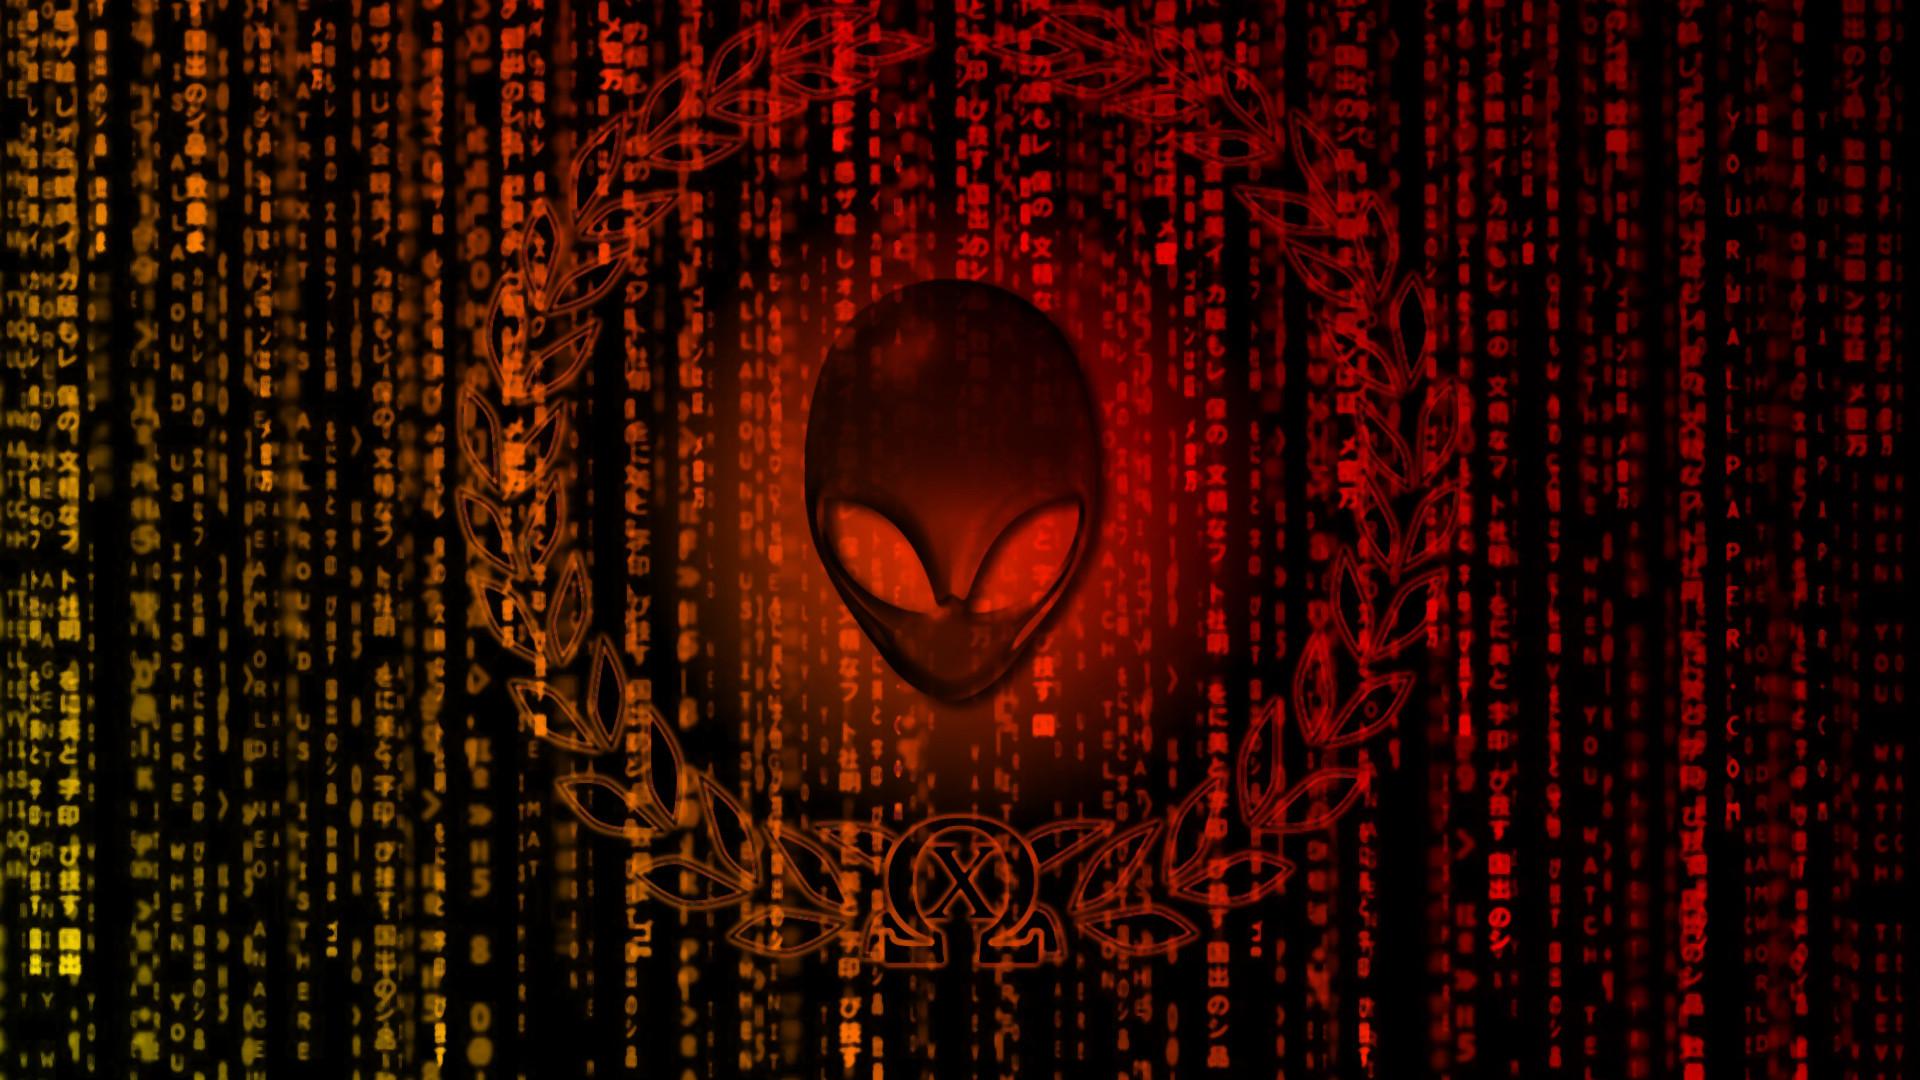 Lieblings Alienware Live Wallpapers (68+ images) #UF_41